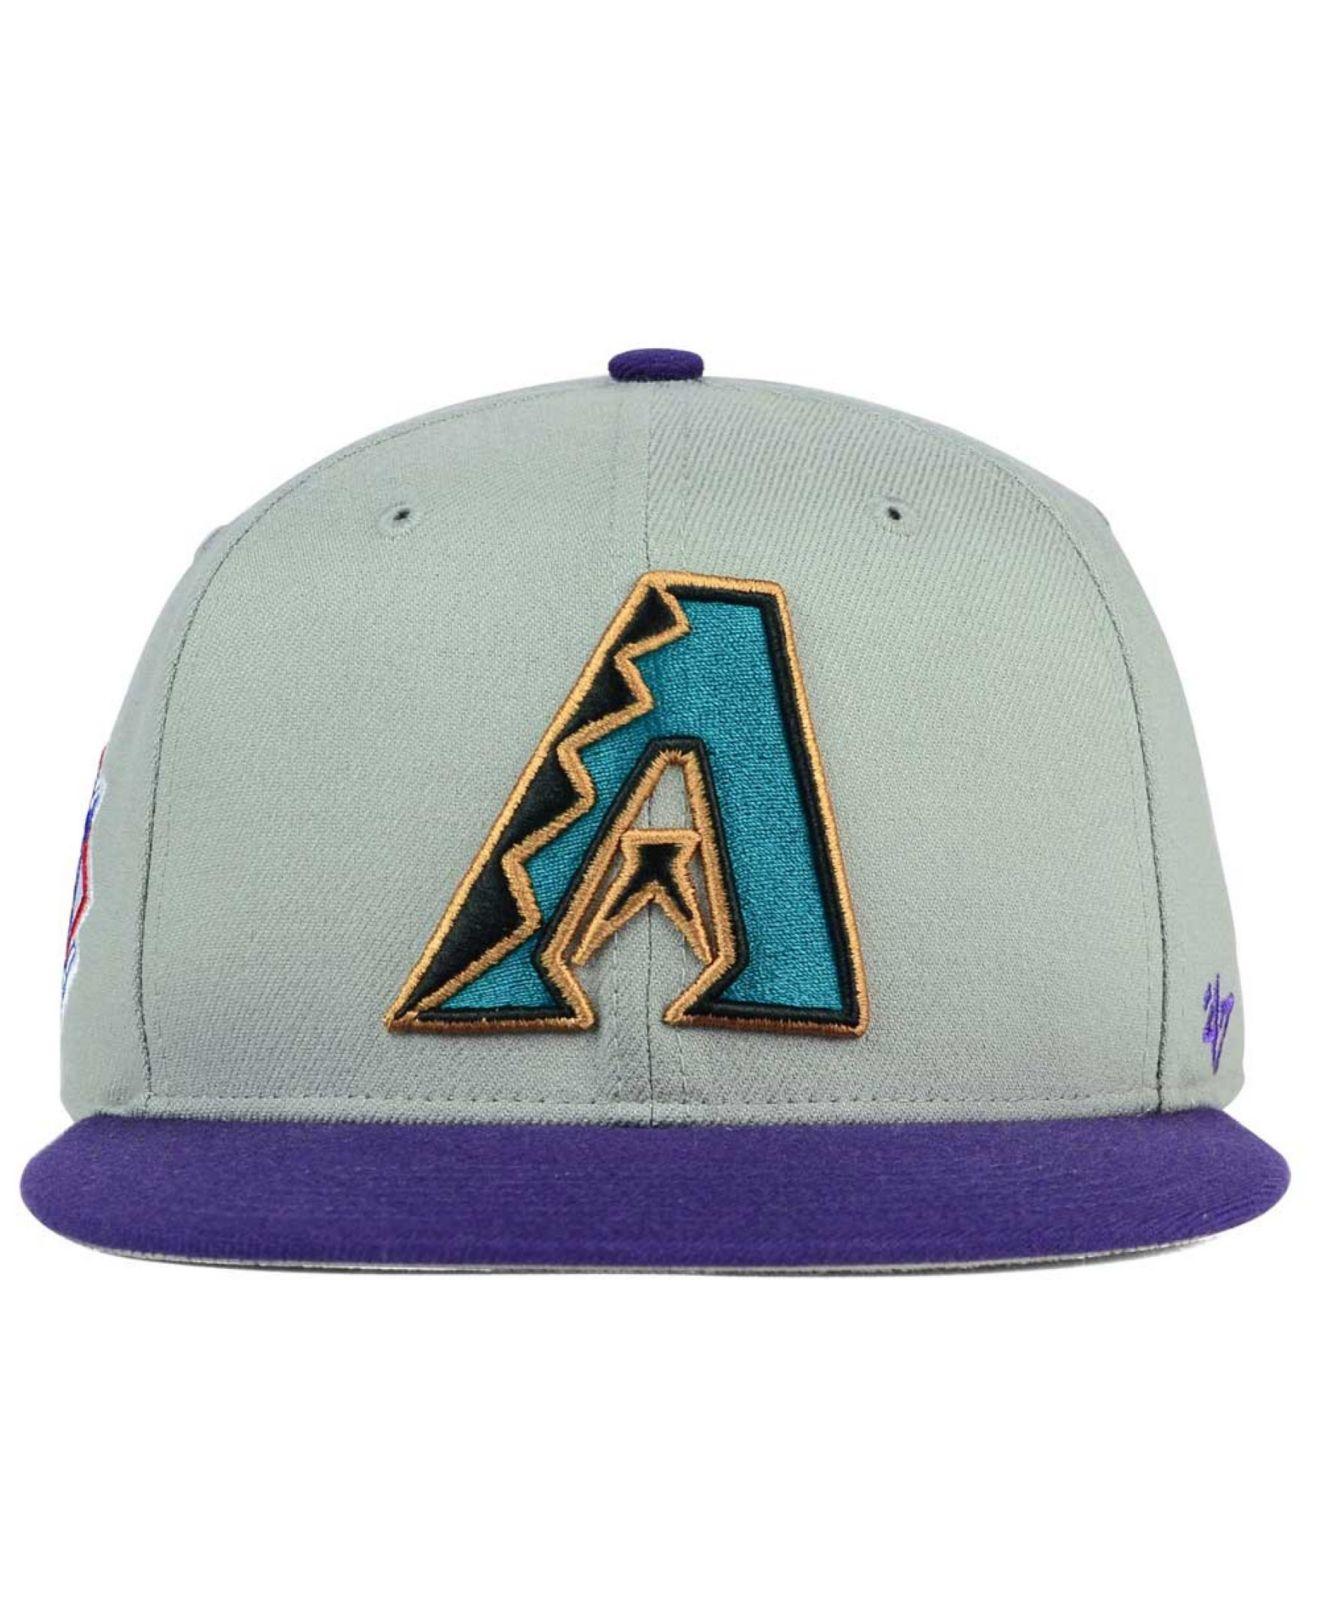 4cbfd359b74 ... australia lyst 47 brand arizona diamondbacks sure shot snapback cap in  gray 8b99e 51f6a